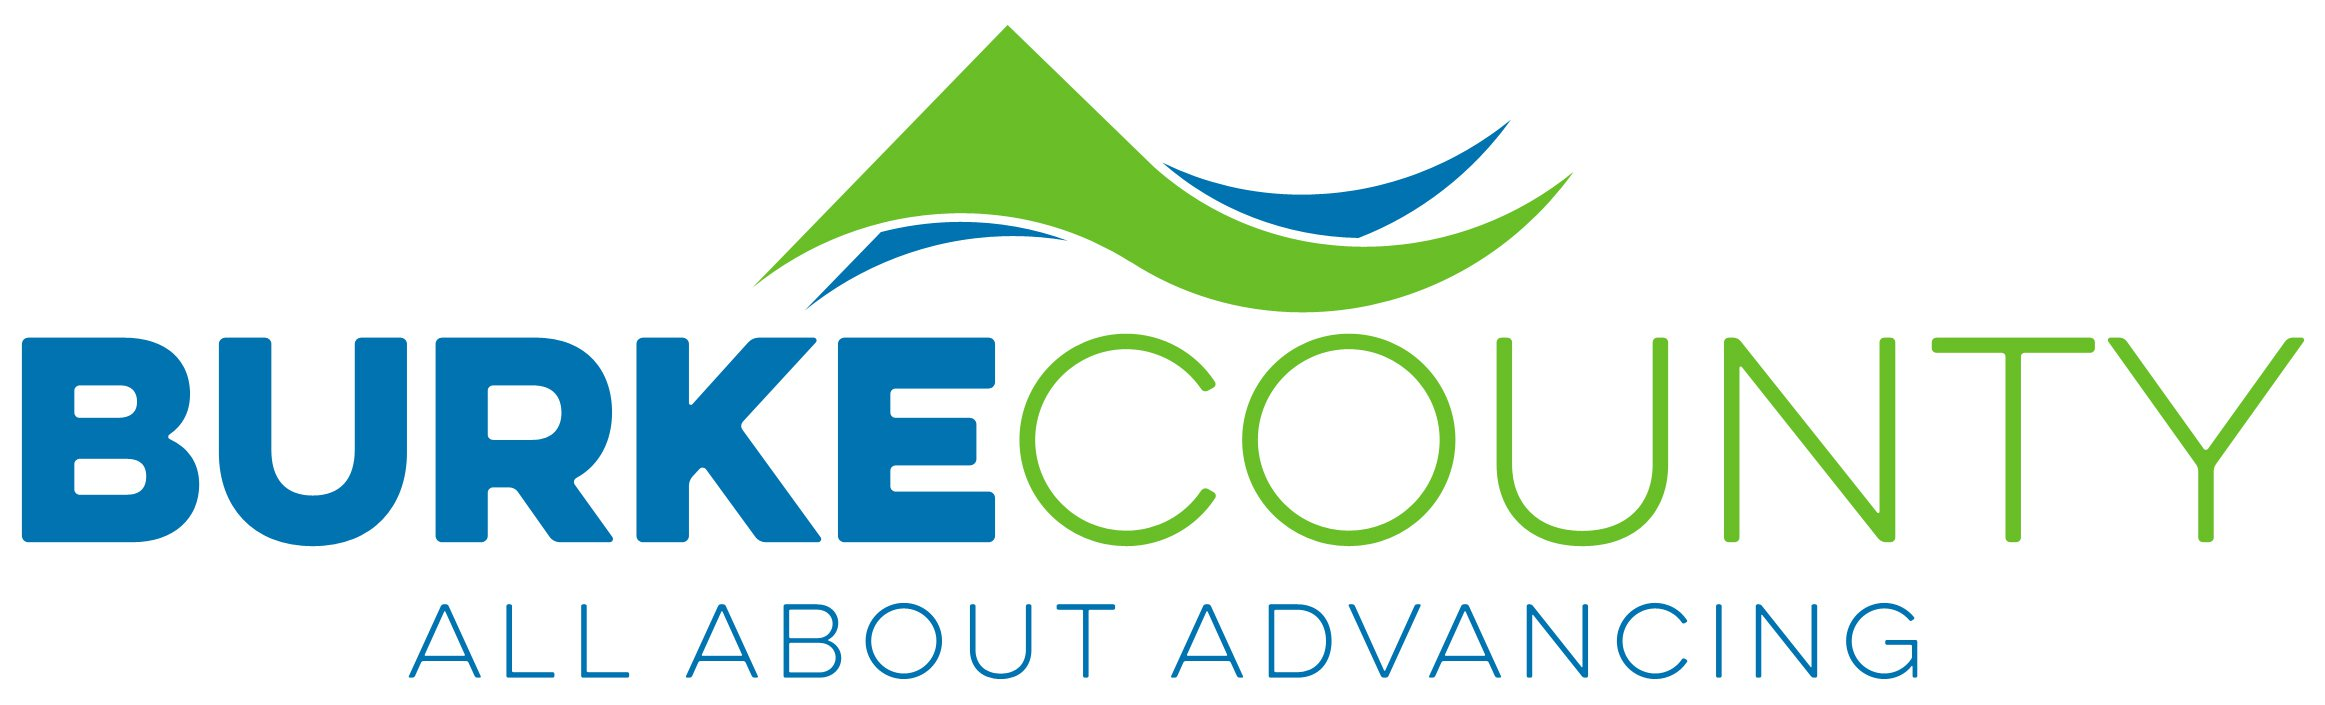 Burke County Logo